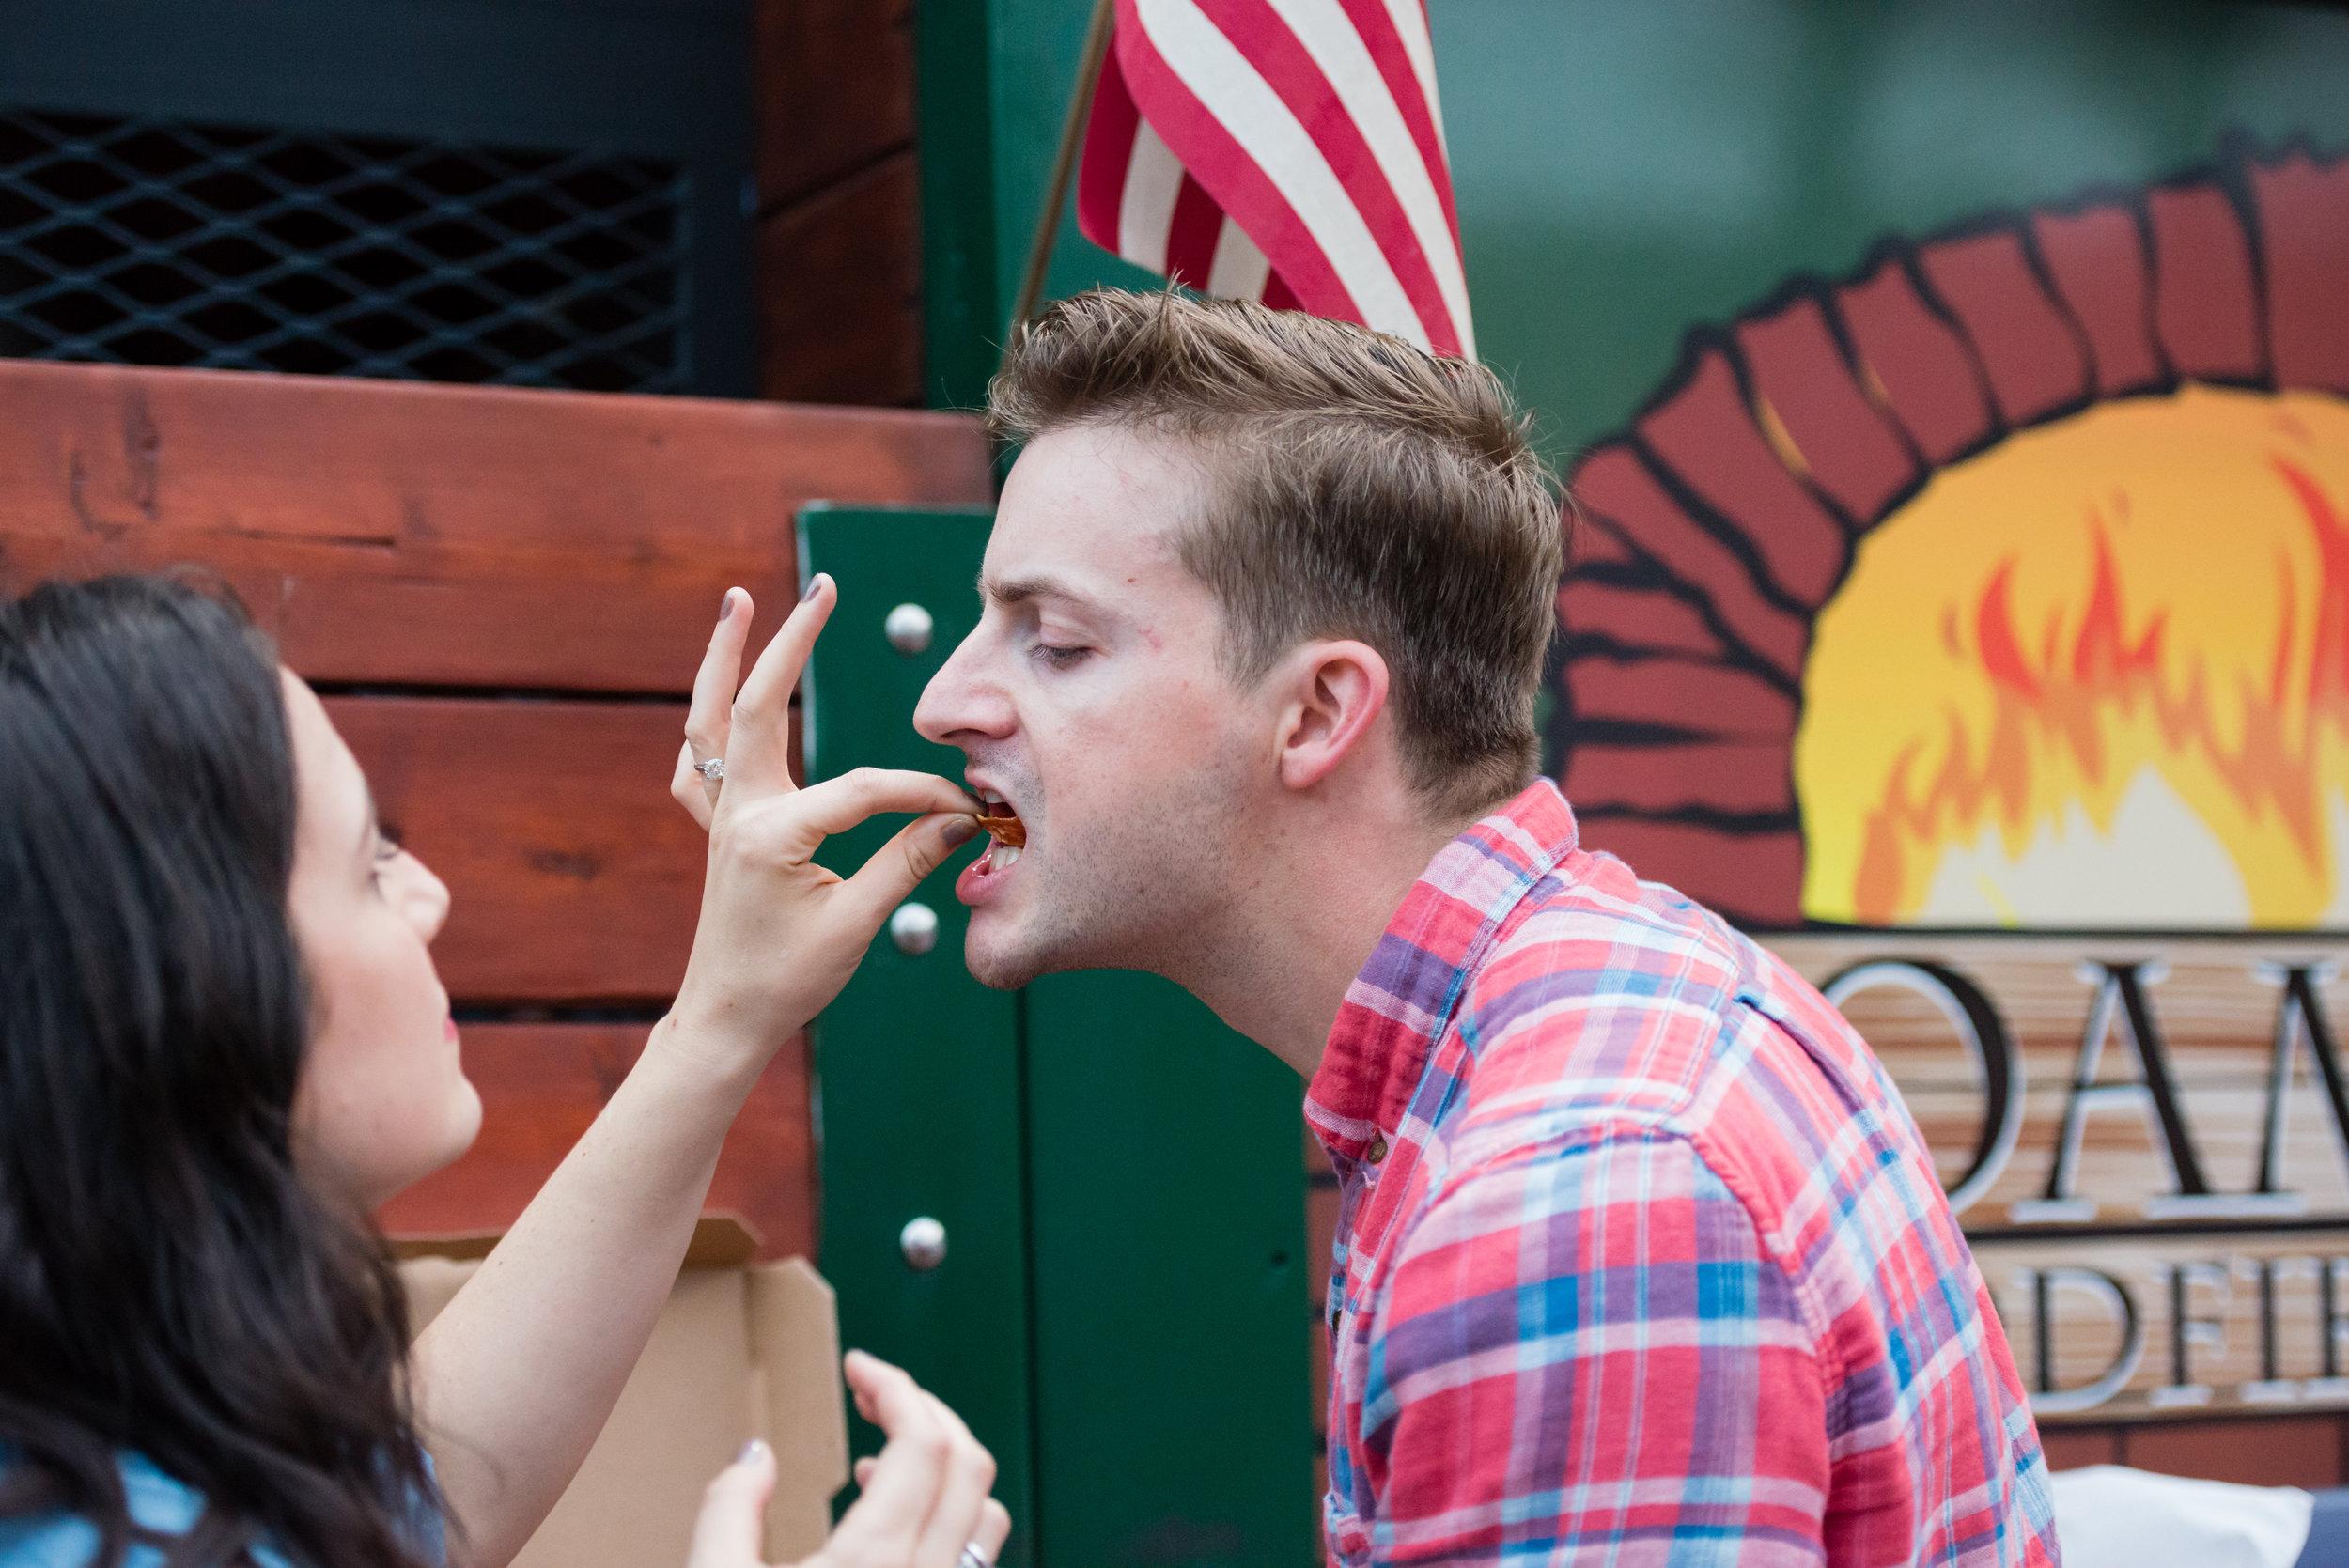 Michael-Leah-Engagement-Shoot-187.jpg